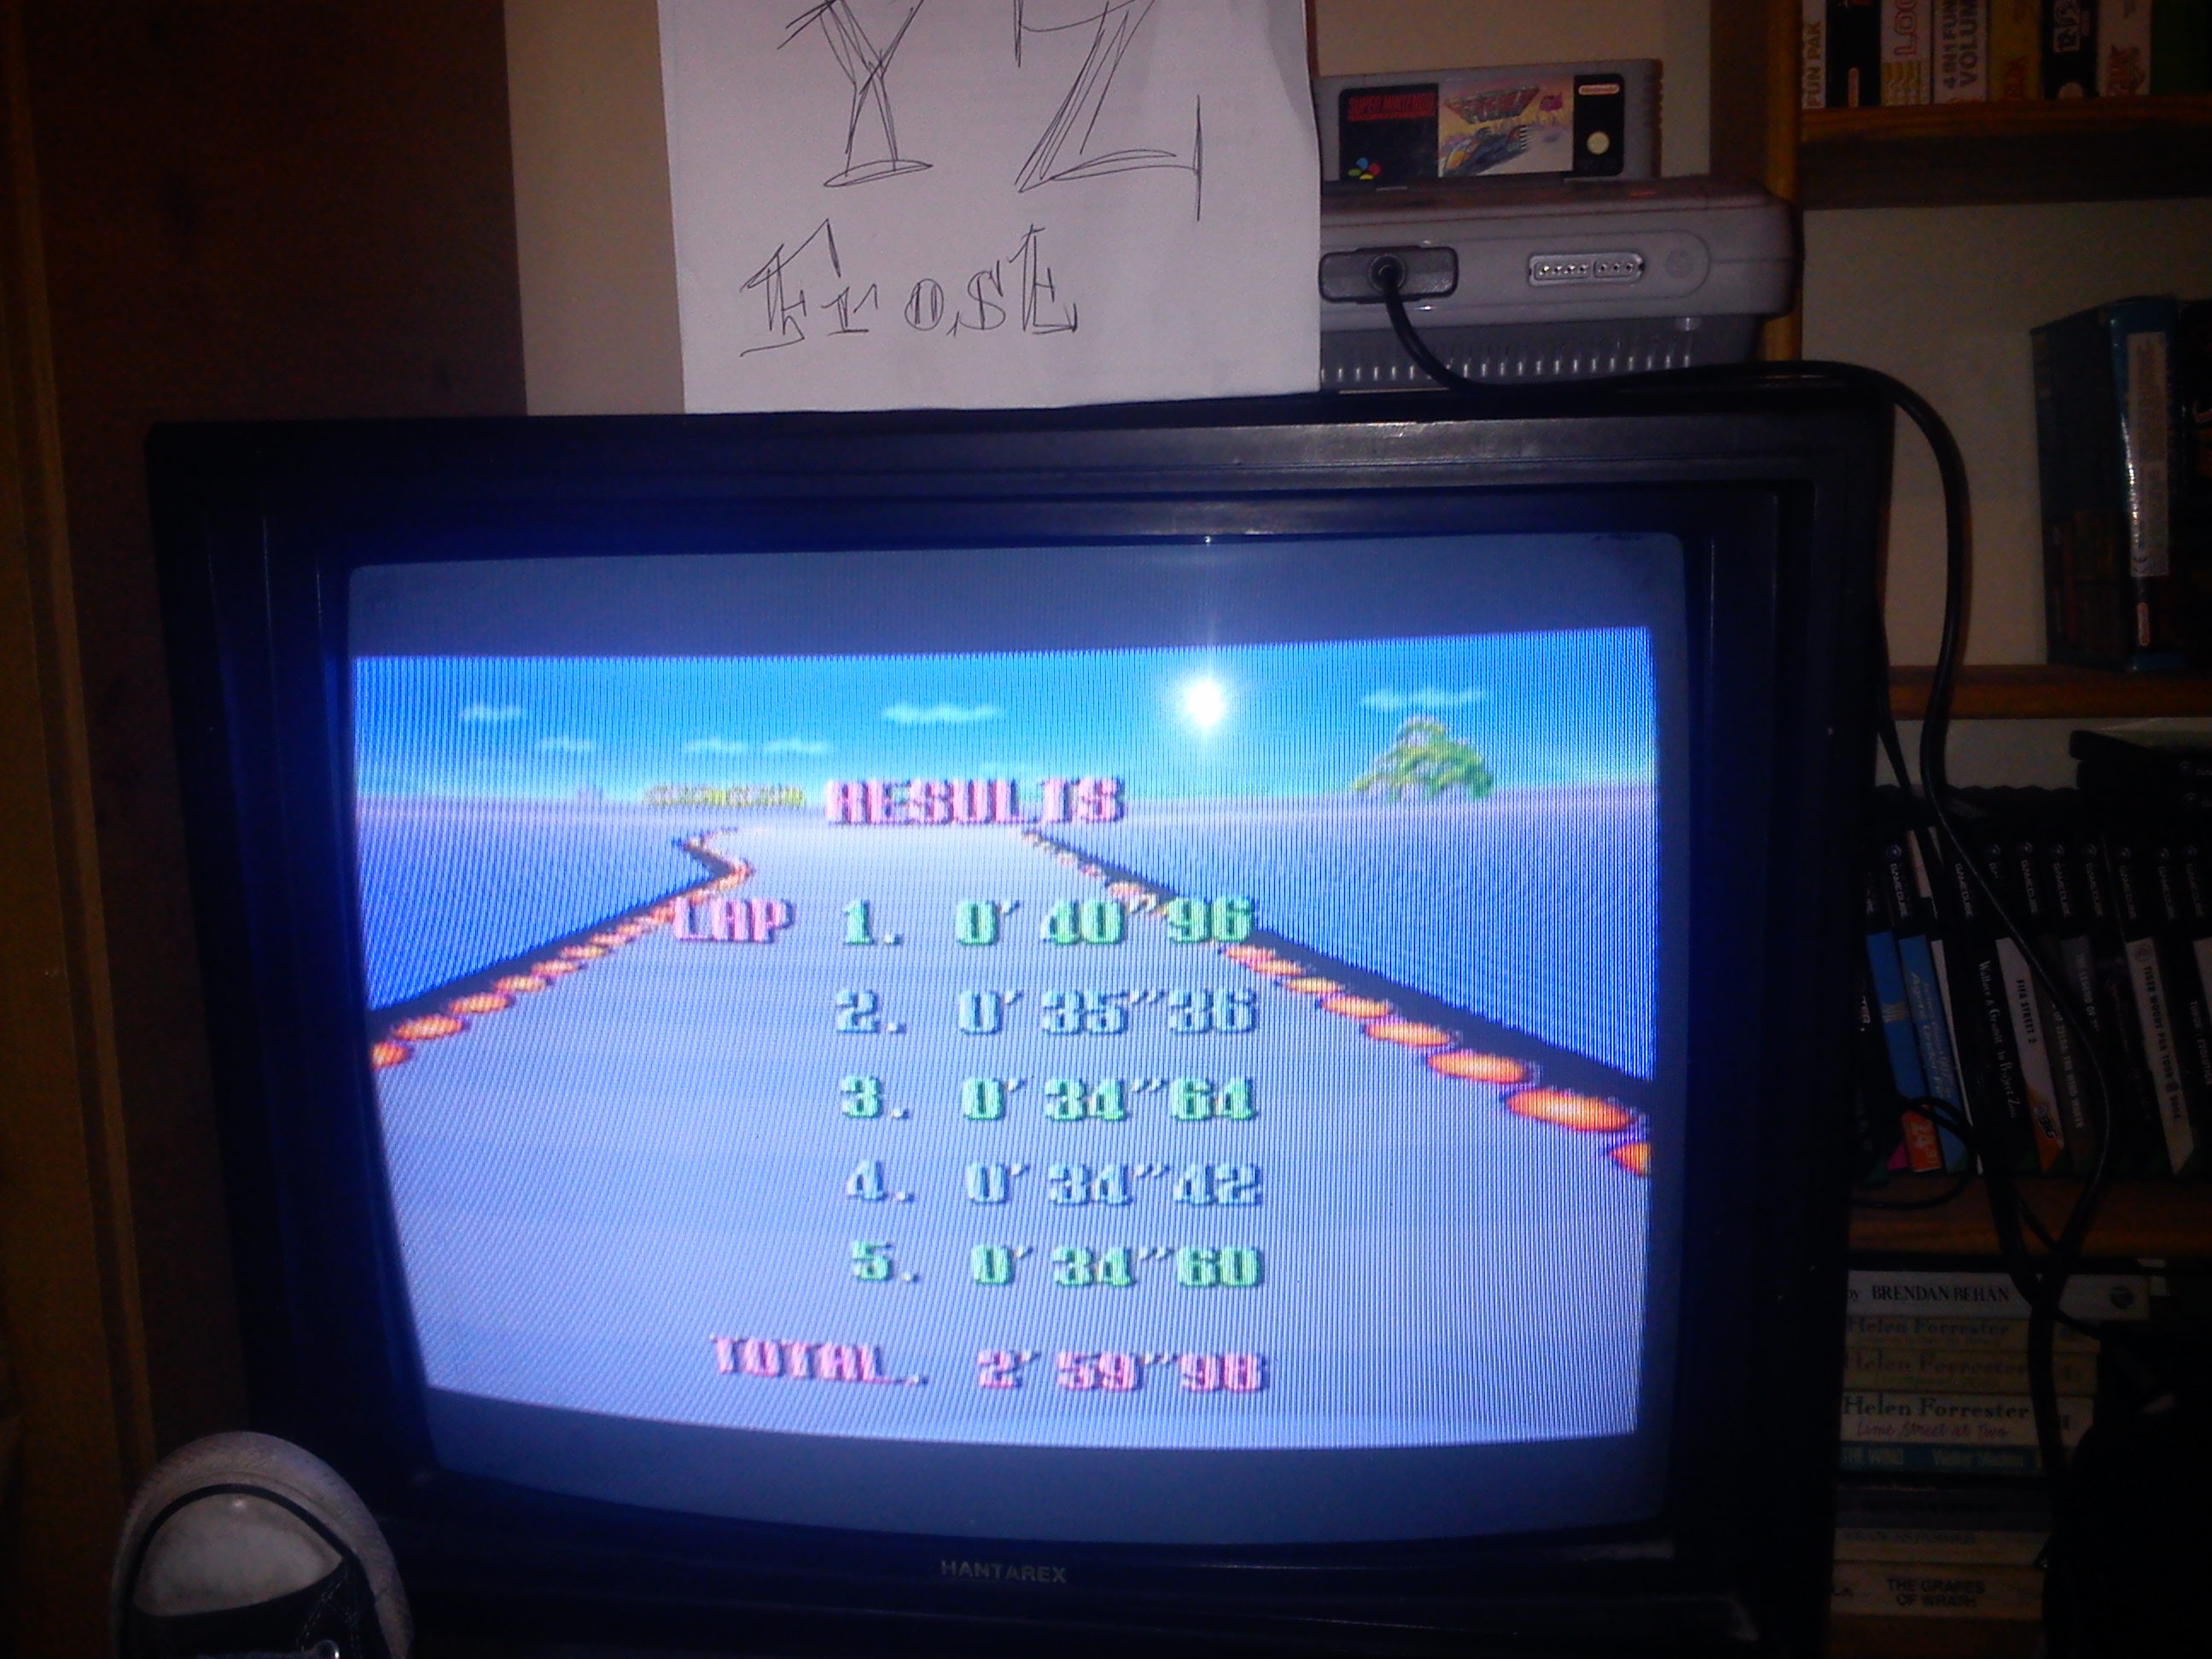 Fr0st: F-Zero: Big Blue [Beginner] (SNES/Super Famicom) 0:02:59.98 points on 2014-11-03 17:06:46